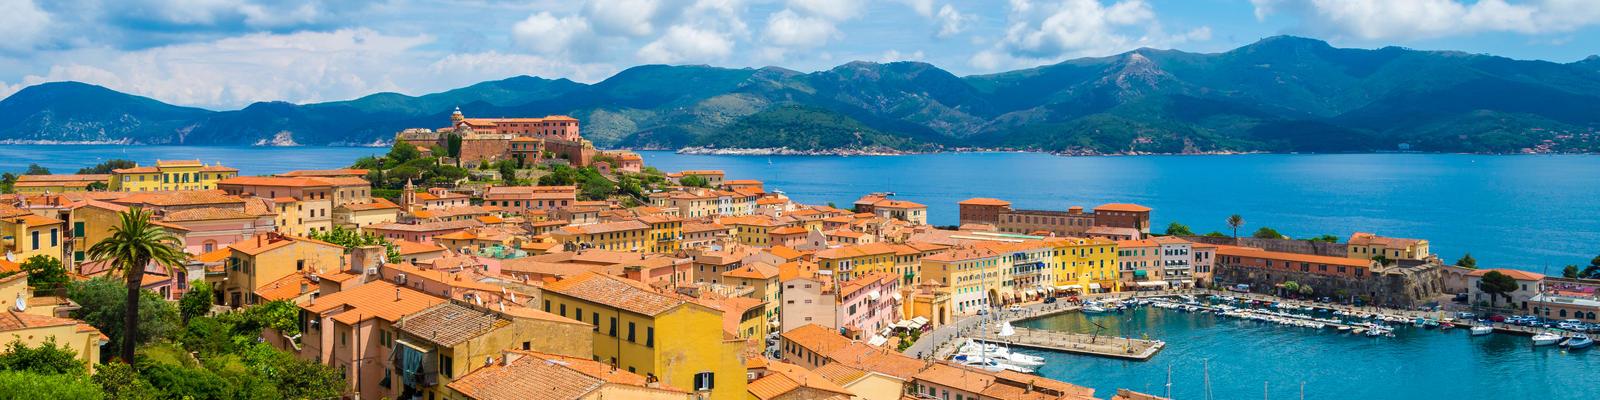 Surviving A Summer Mediterranean Cruise Cruise Critic